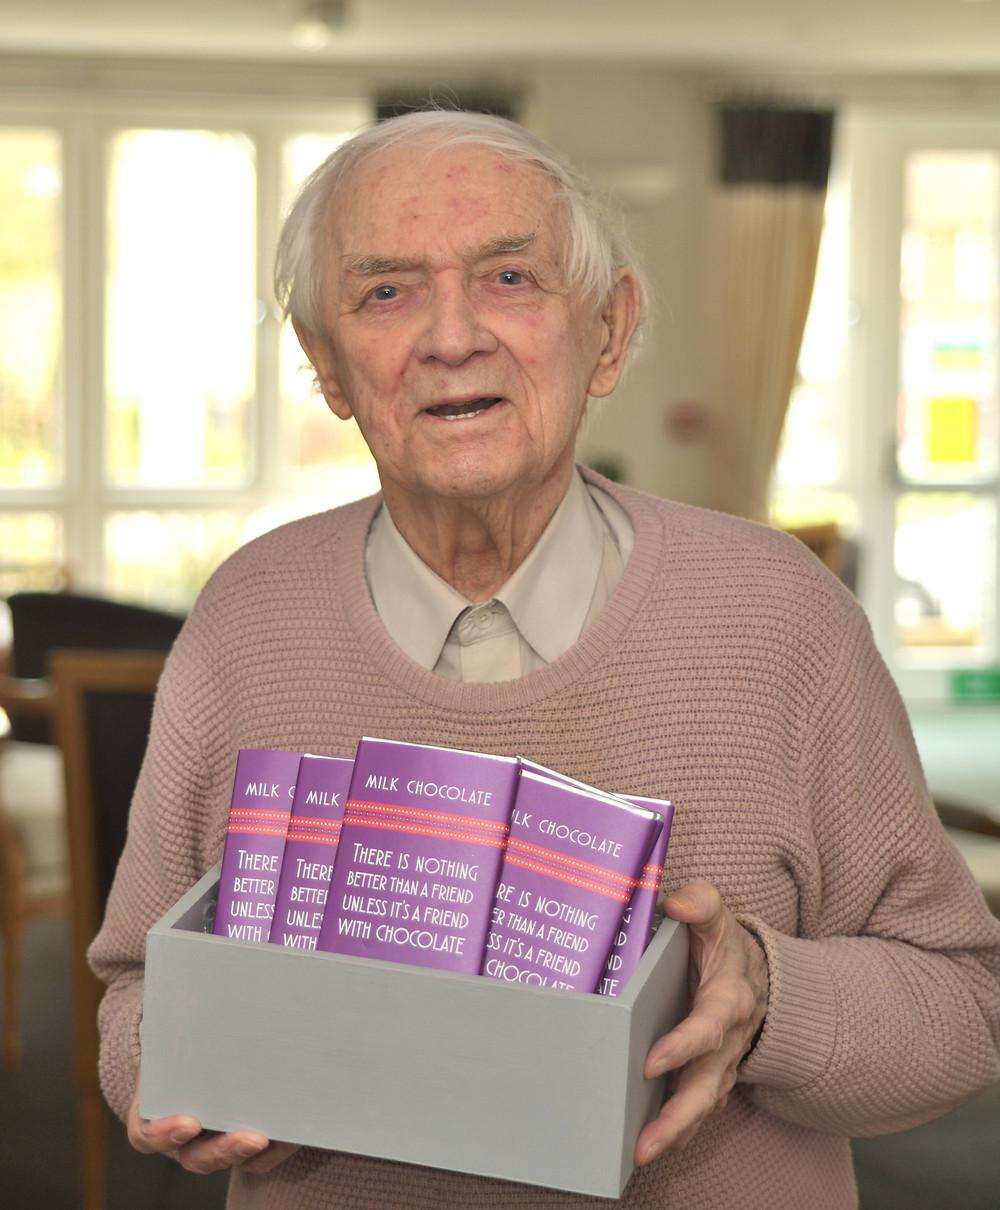 WWII veteran John Clark with Easter chocolate